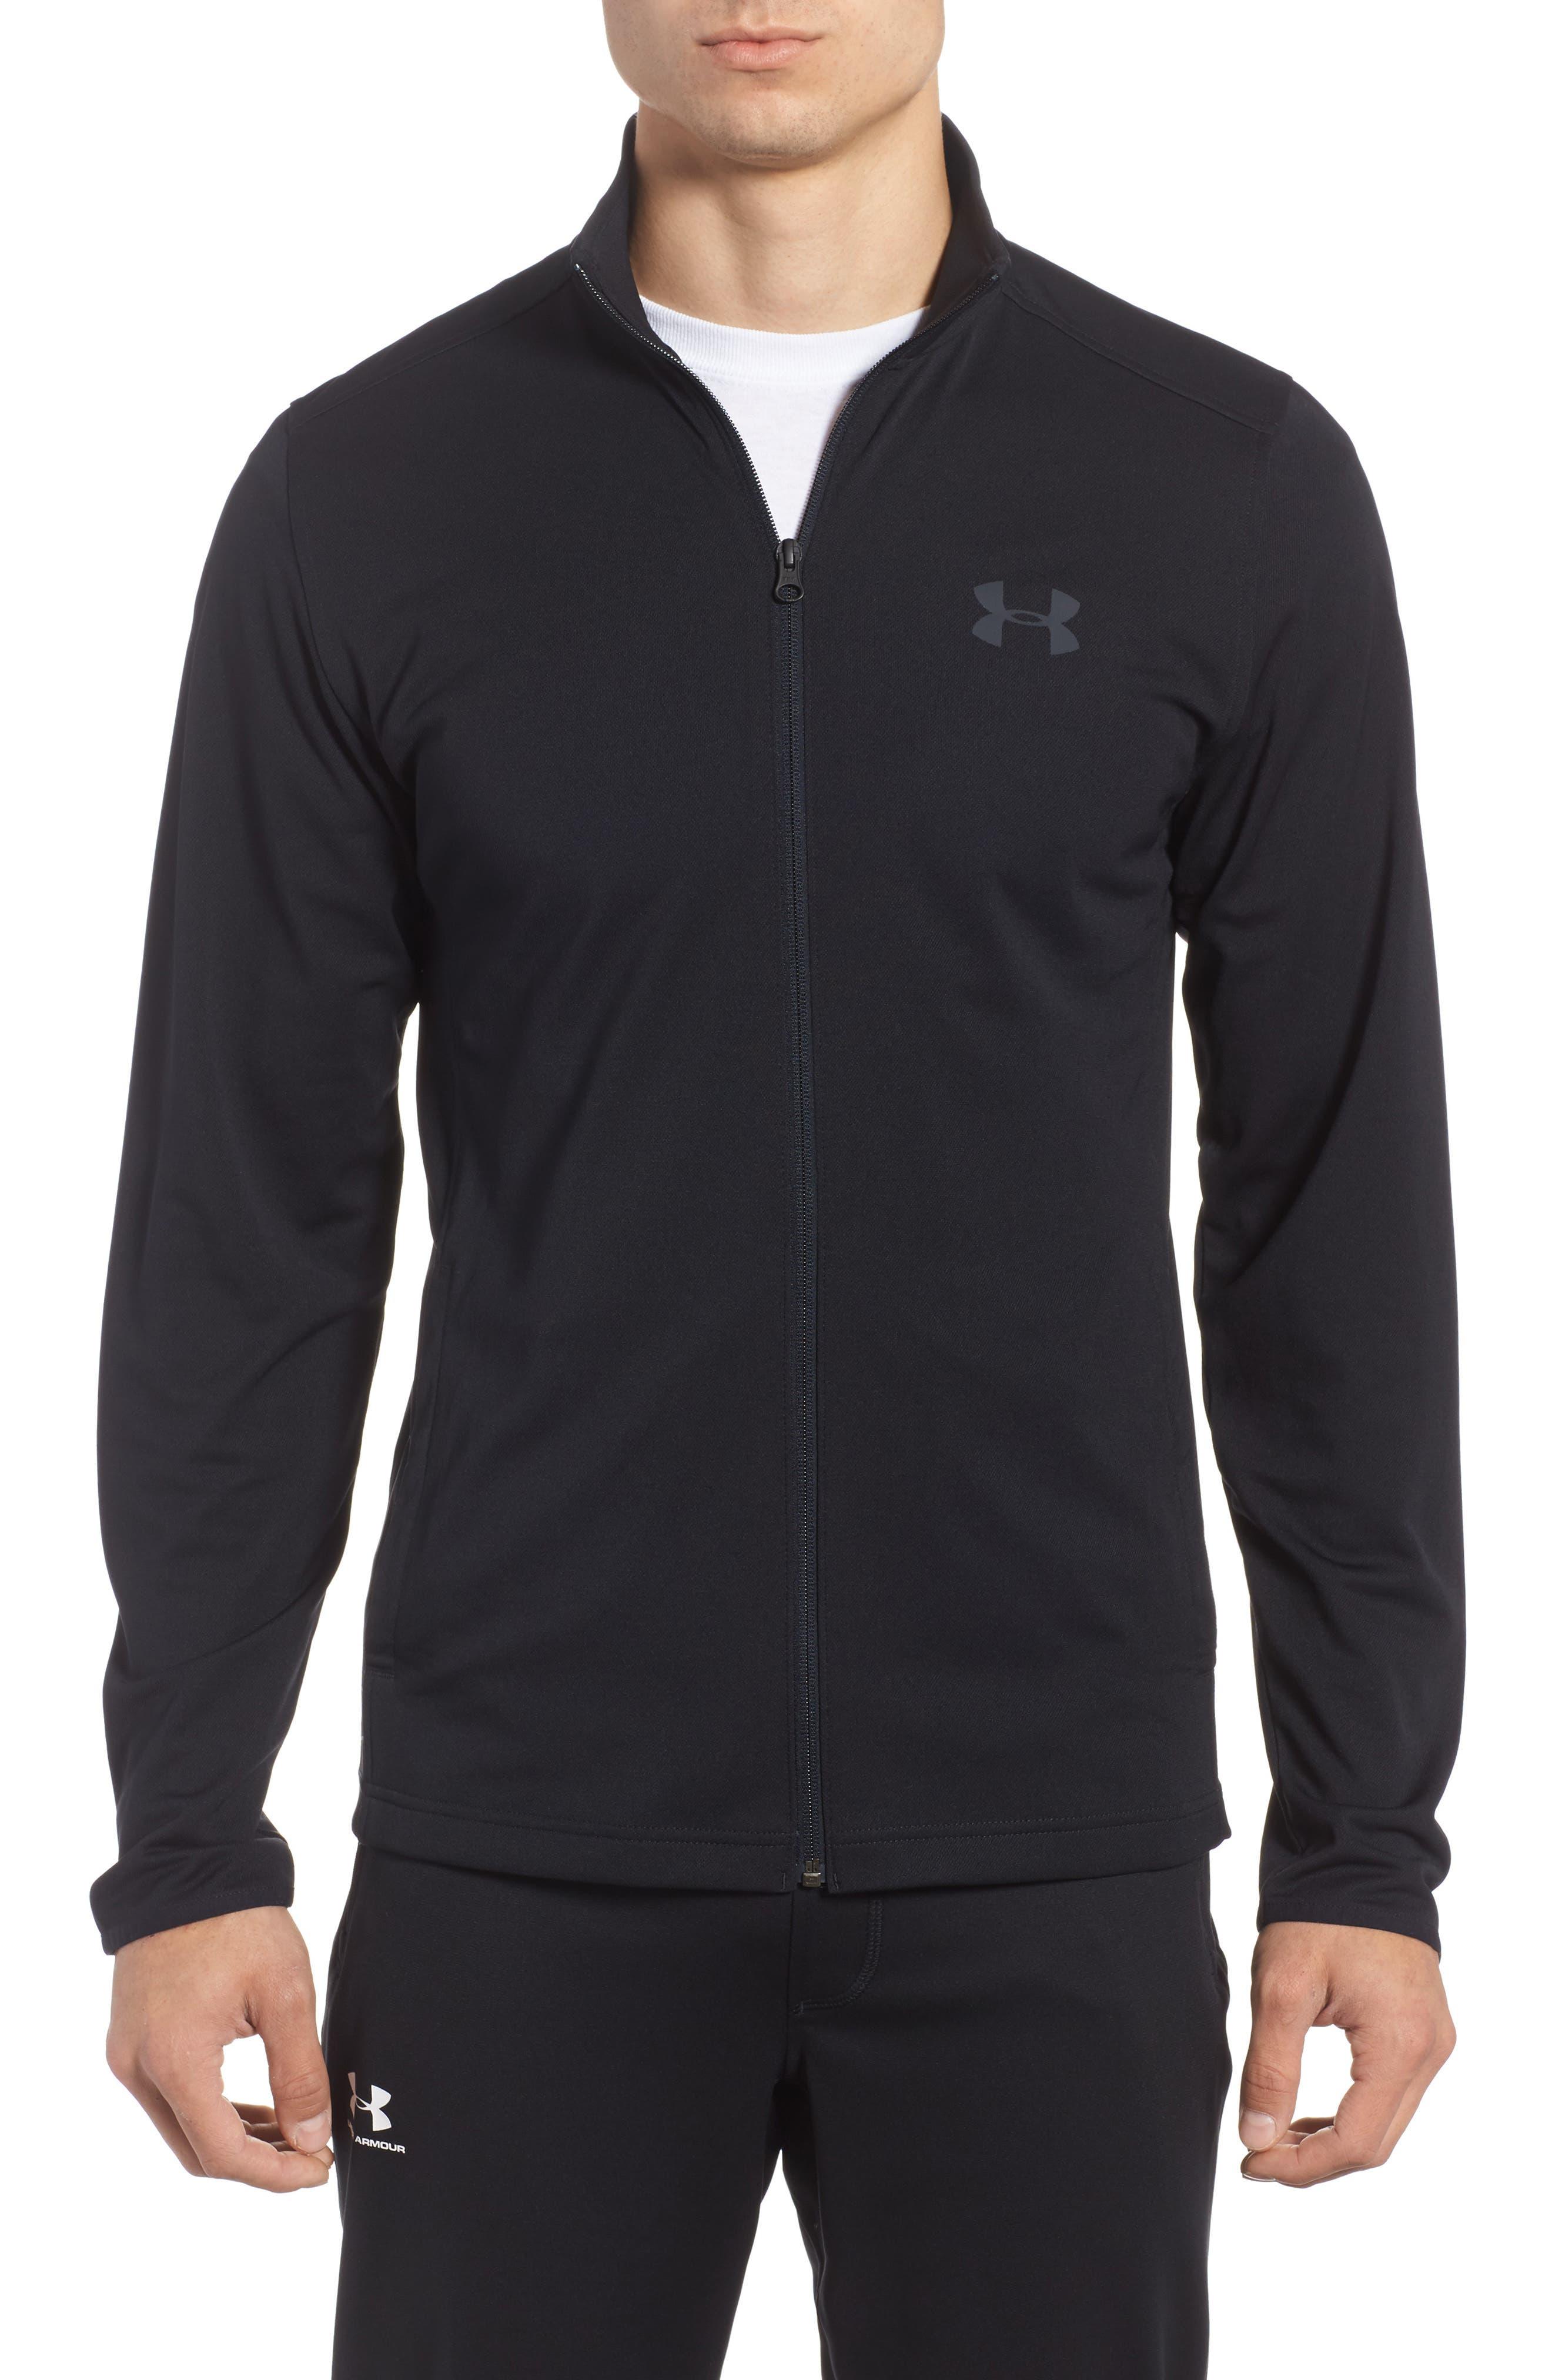 Alternate Image 1 Selected - Under Armour HeatGear® Regular Fit Maverick Jacket